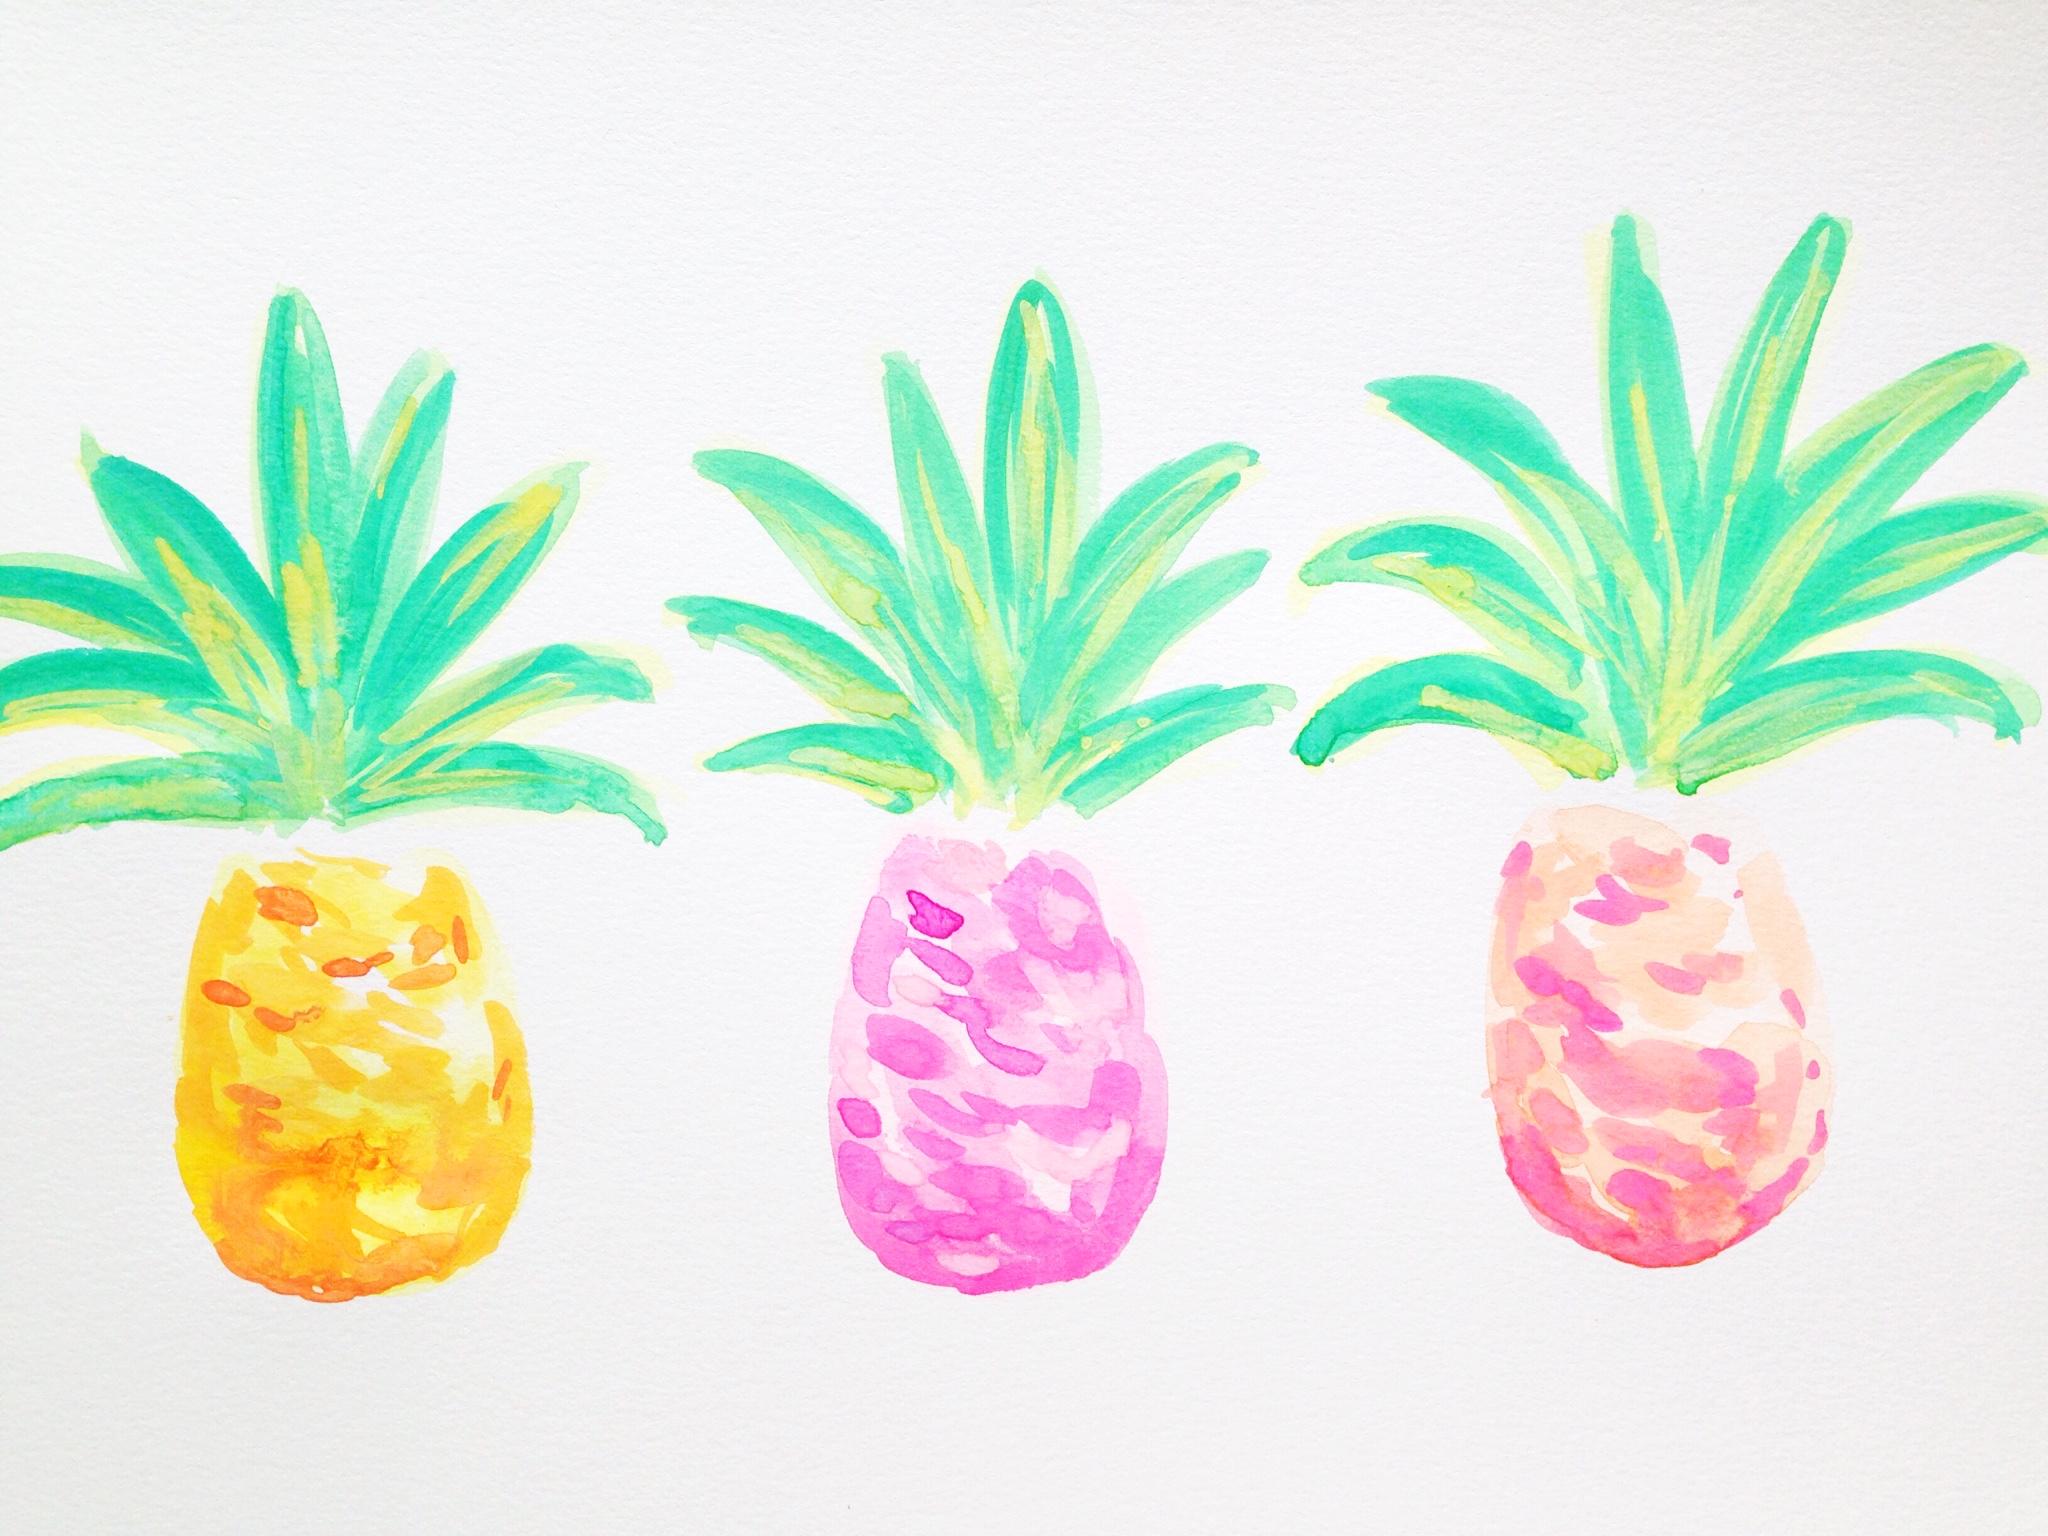 Watercolor Pineapples | Work In Progress | Hello Monday Design